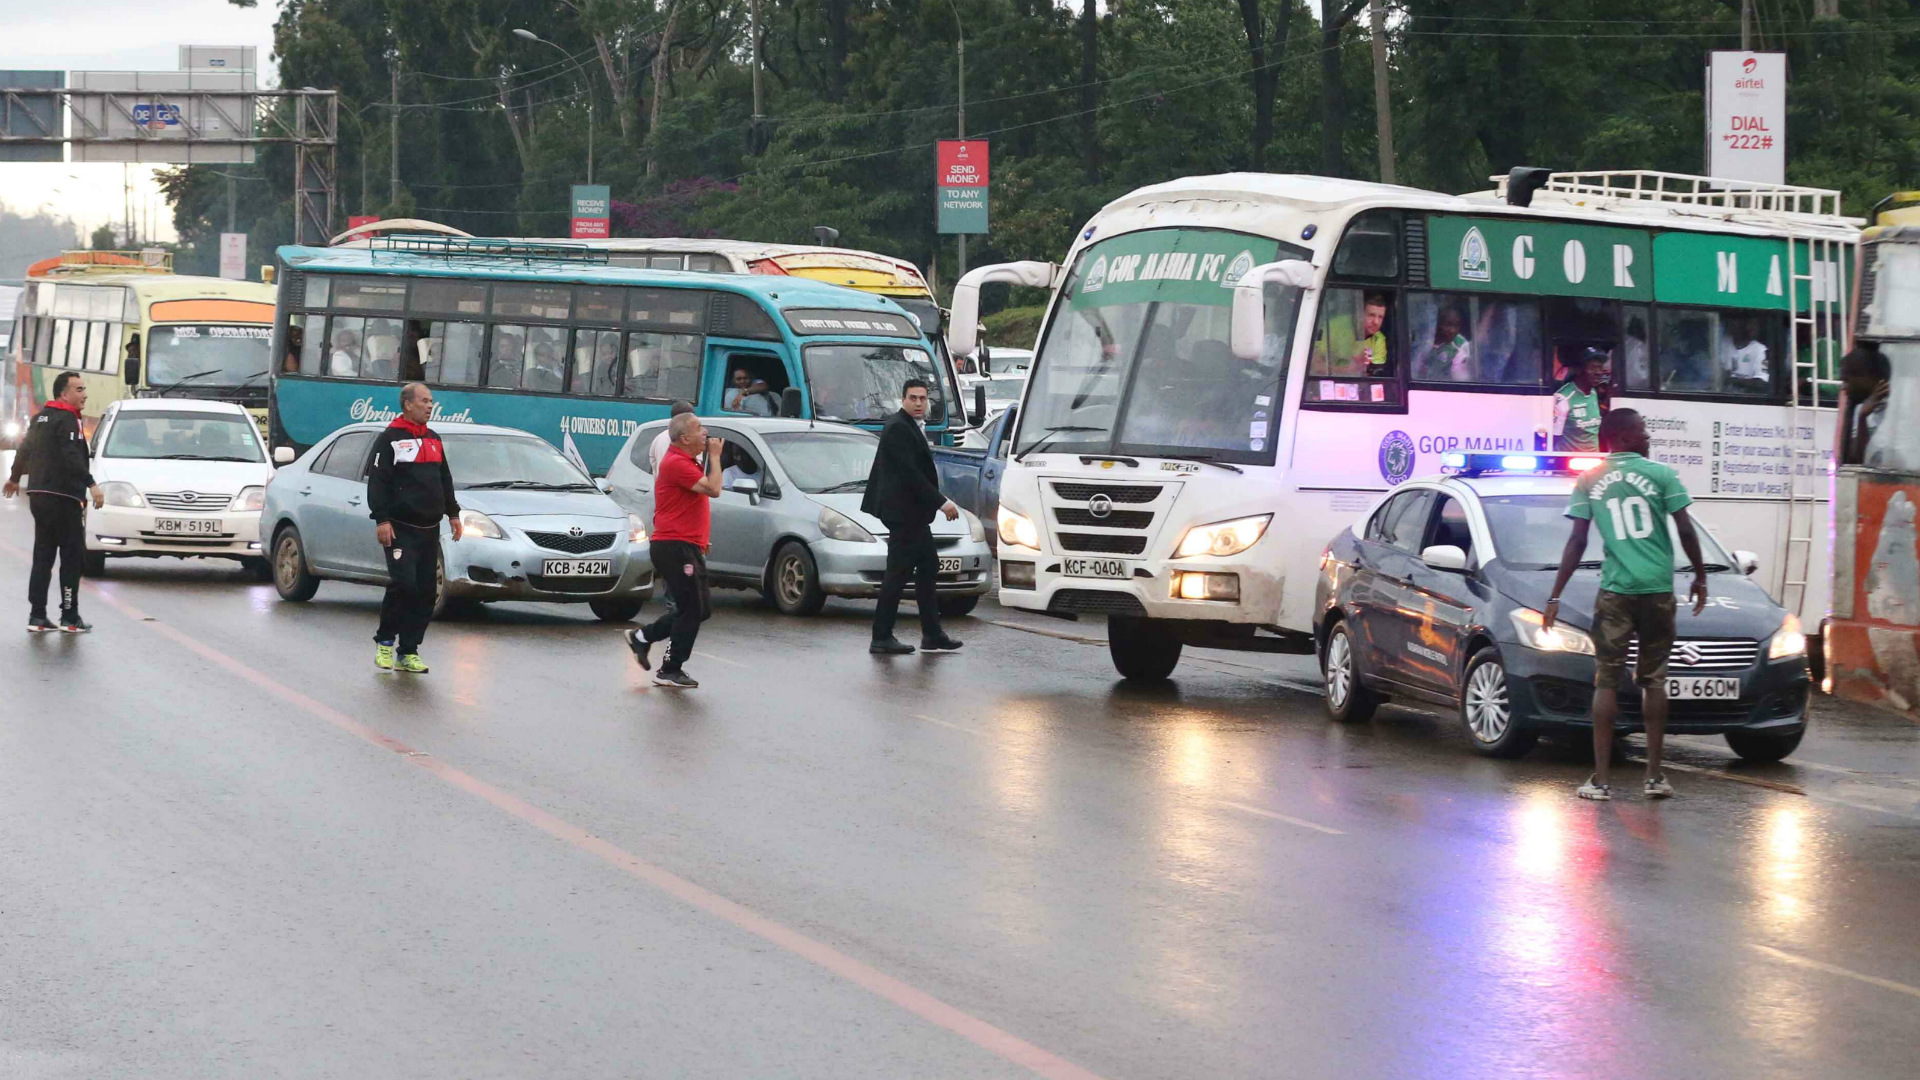 USM Alger v Gor Mahia traffic.